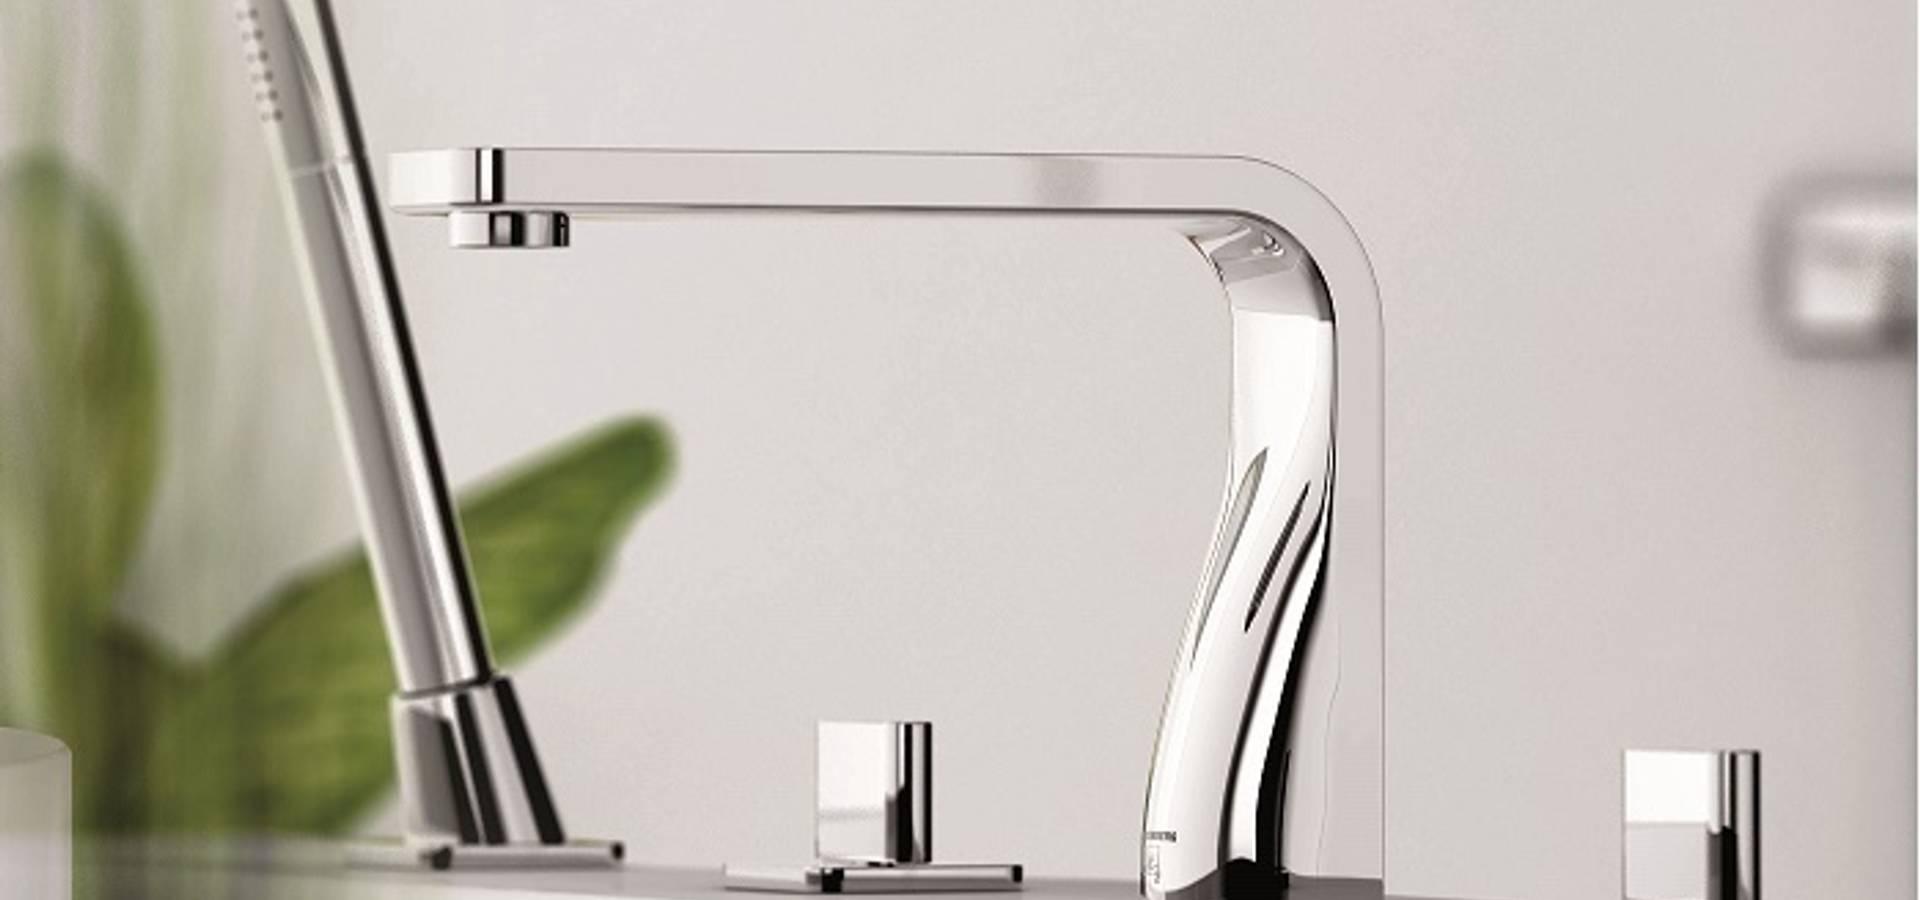 steinberg keuken sanitair armaturen in wroc aw homify. Black Bedroom Furniture Sets. Home Design Ideas